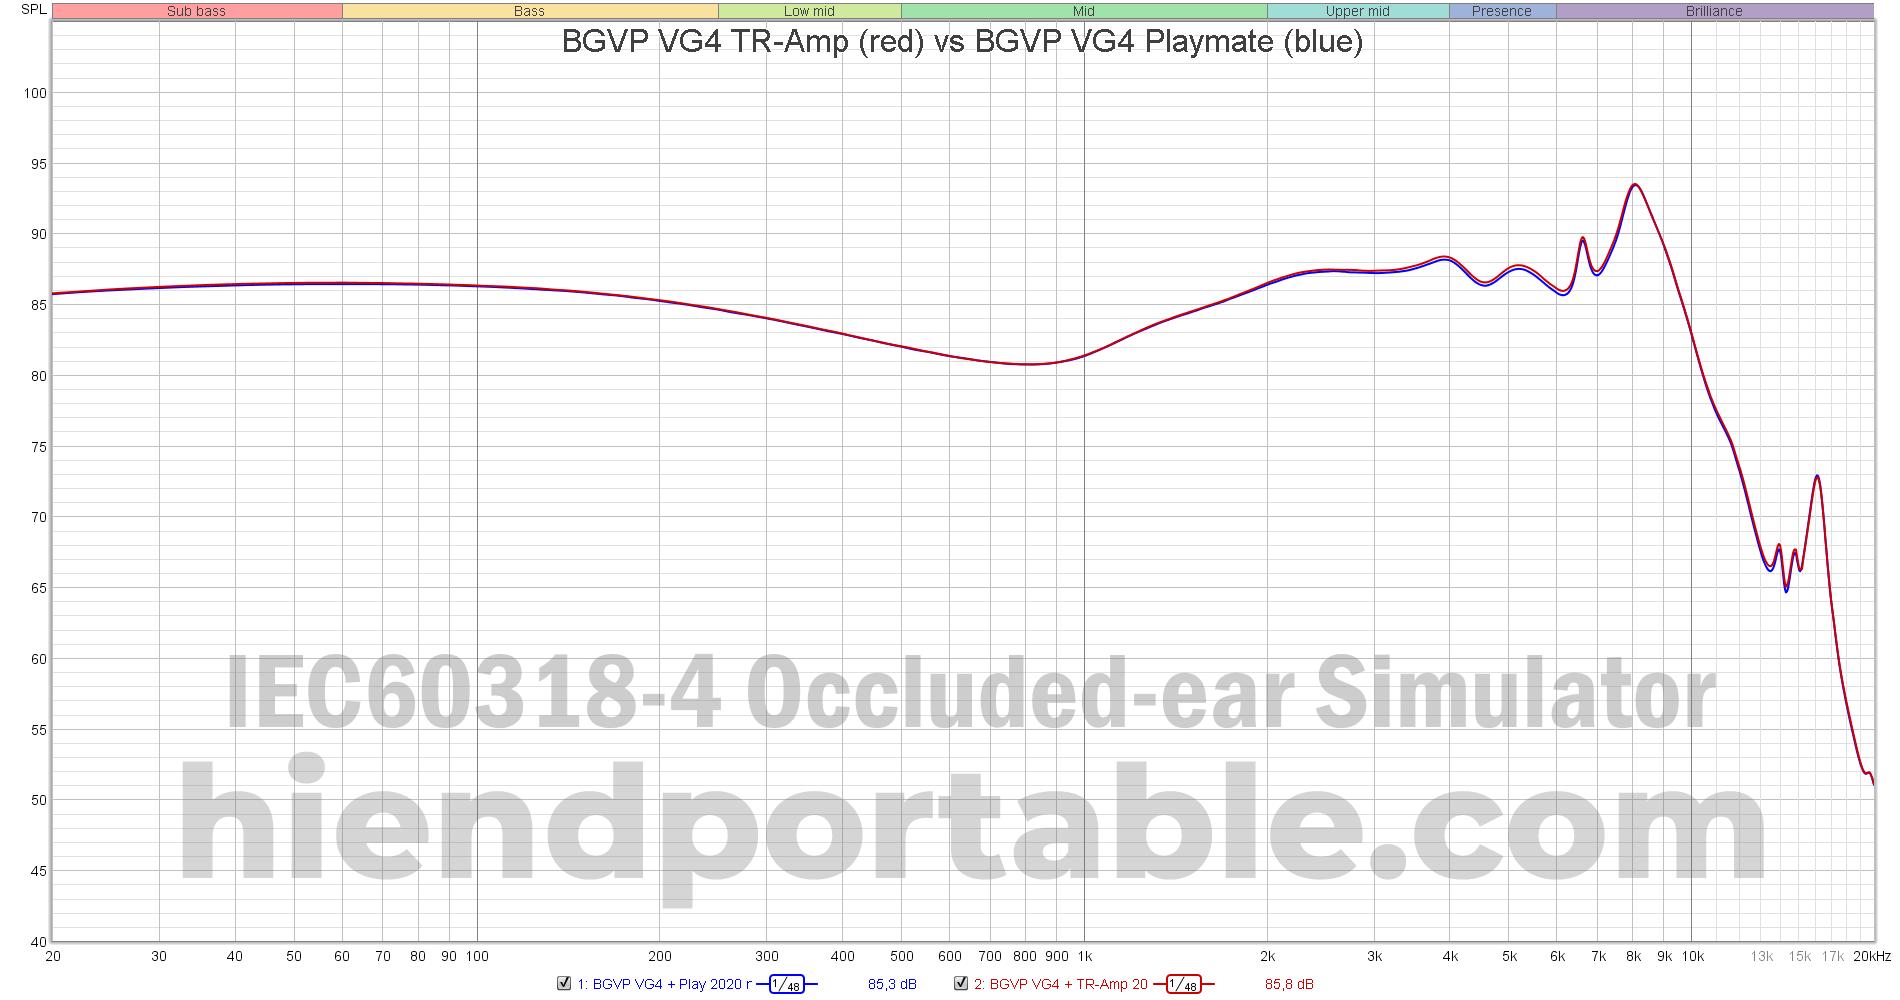 BGVP-VG4-TR-Amp-vs-BGVP-VG4-Playmate.png